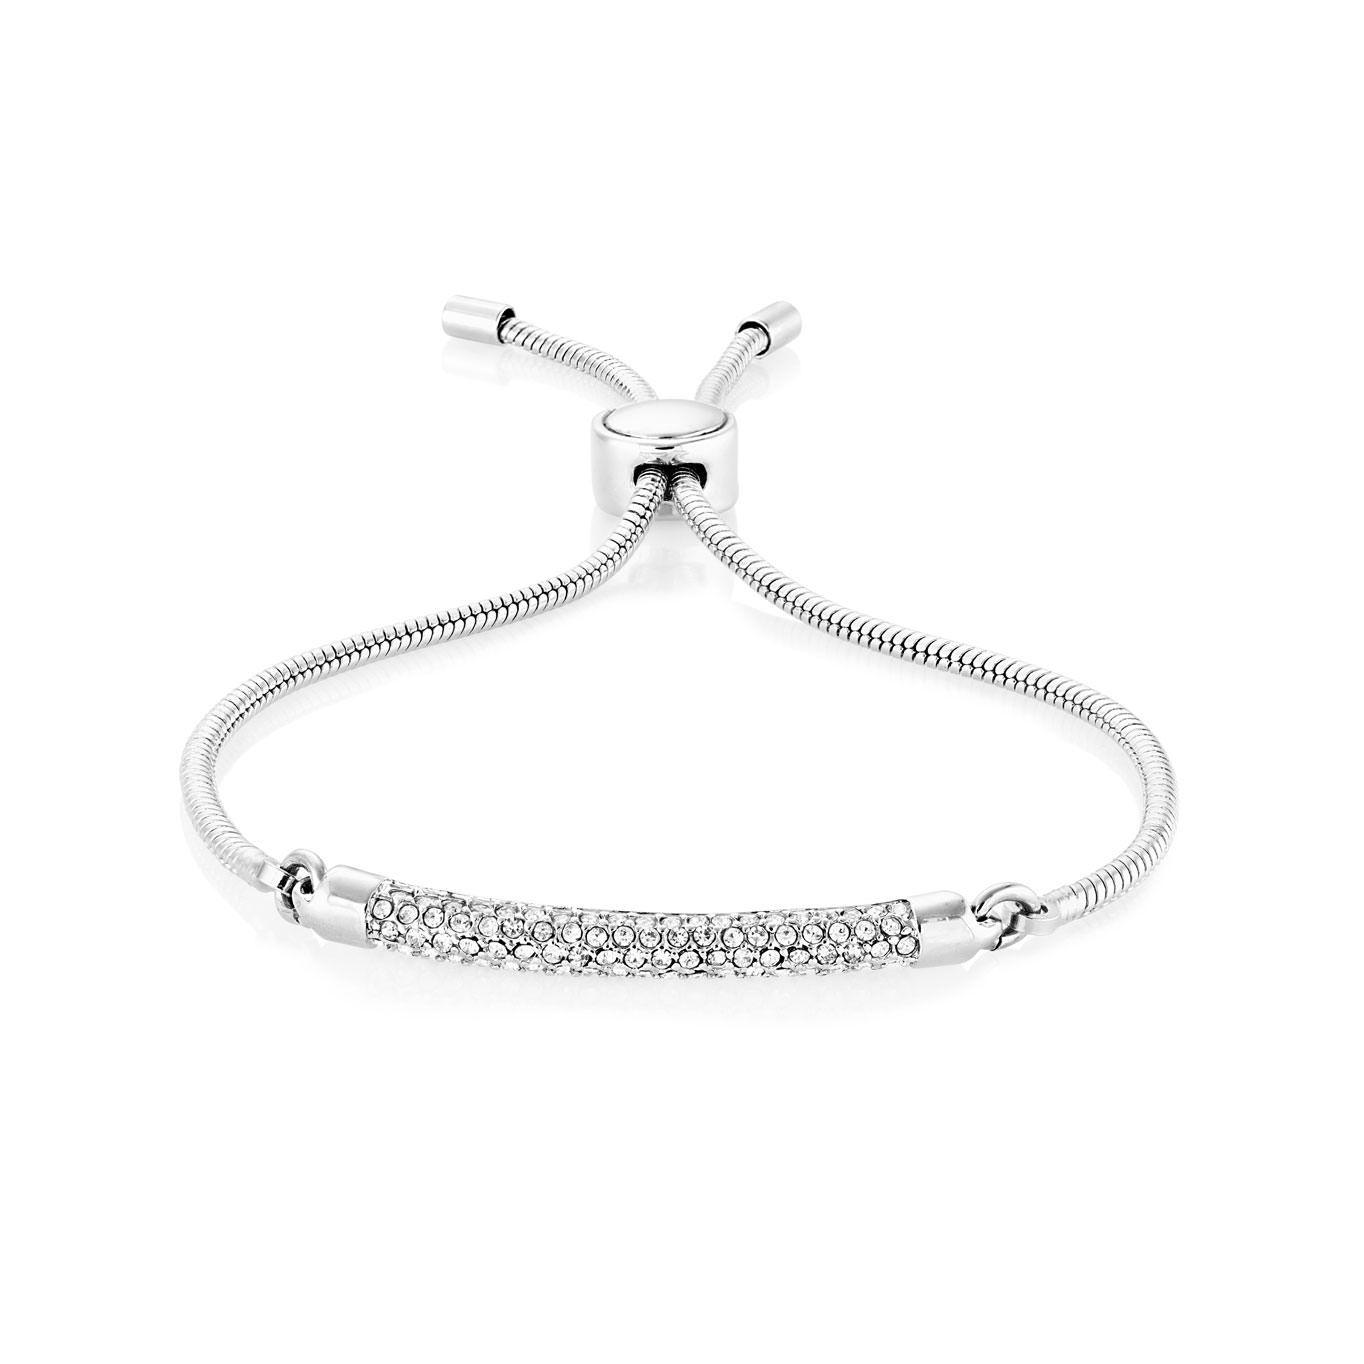 Buckley London Hampton Bracelet - Silver